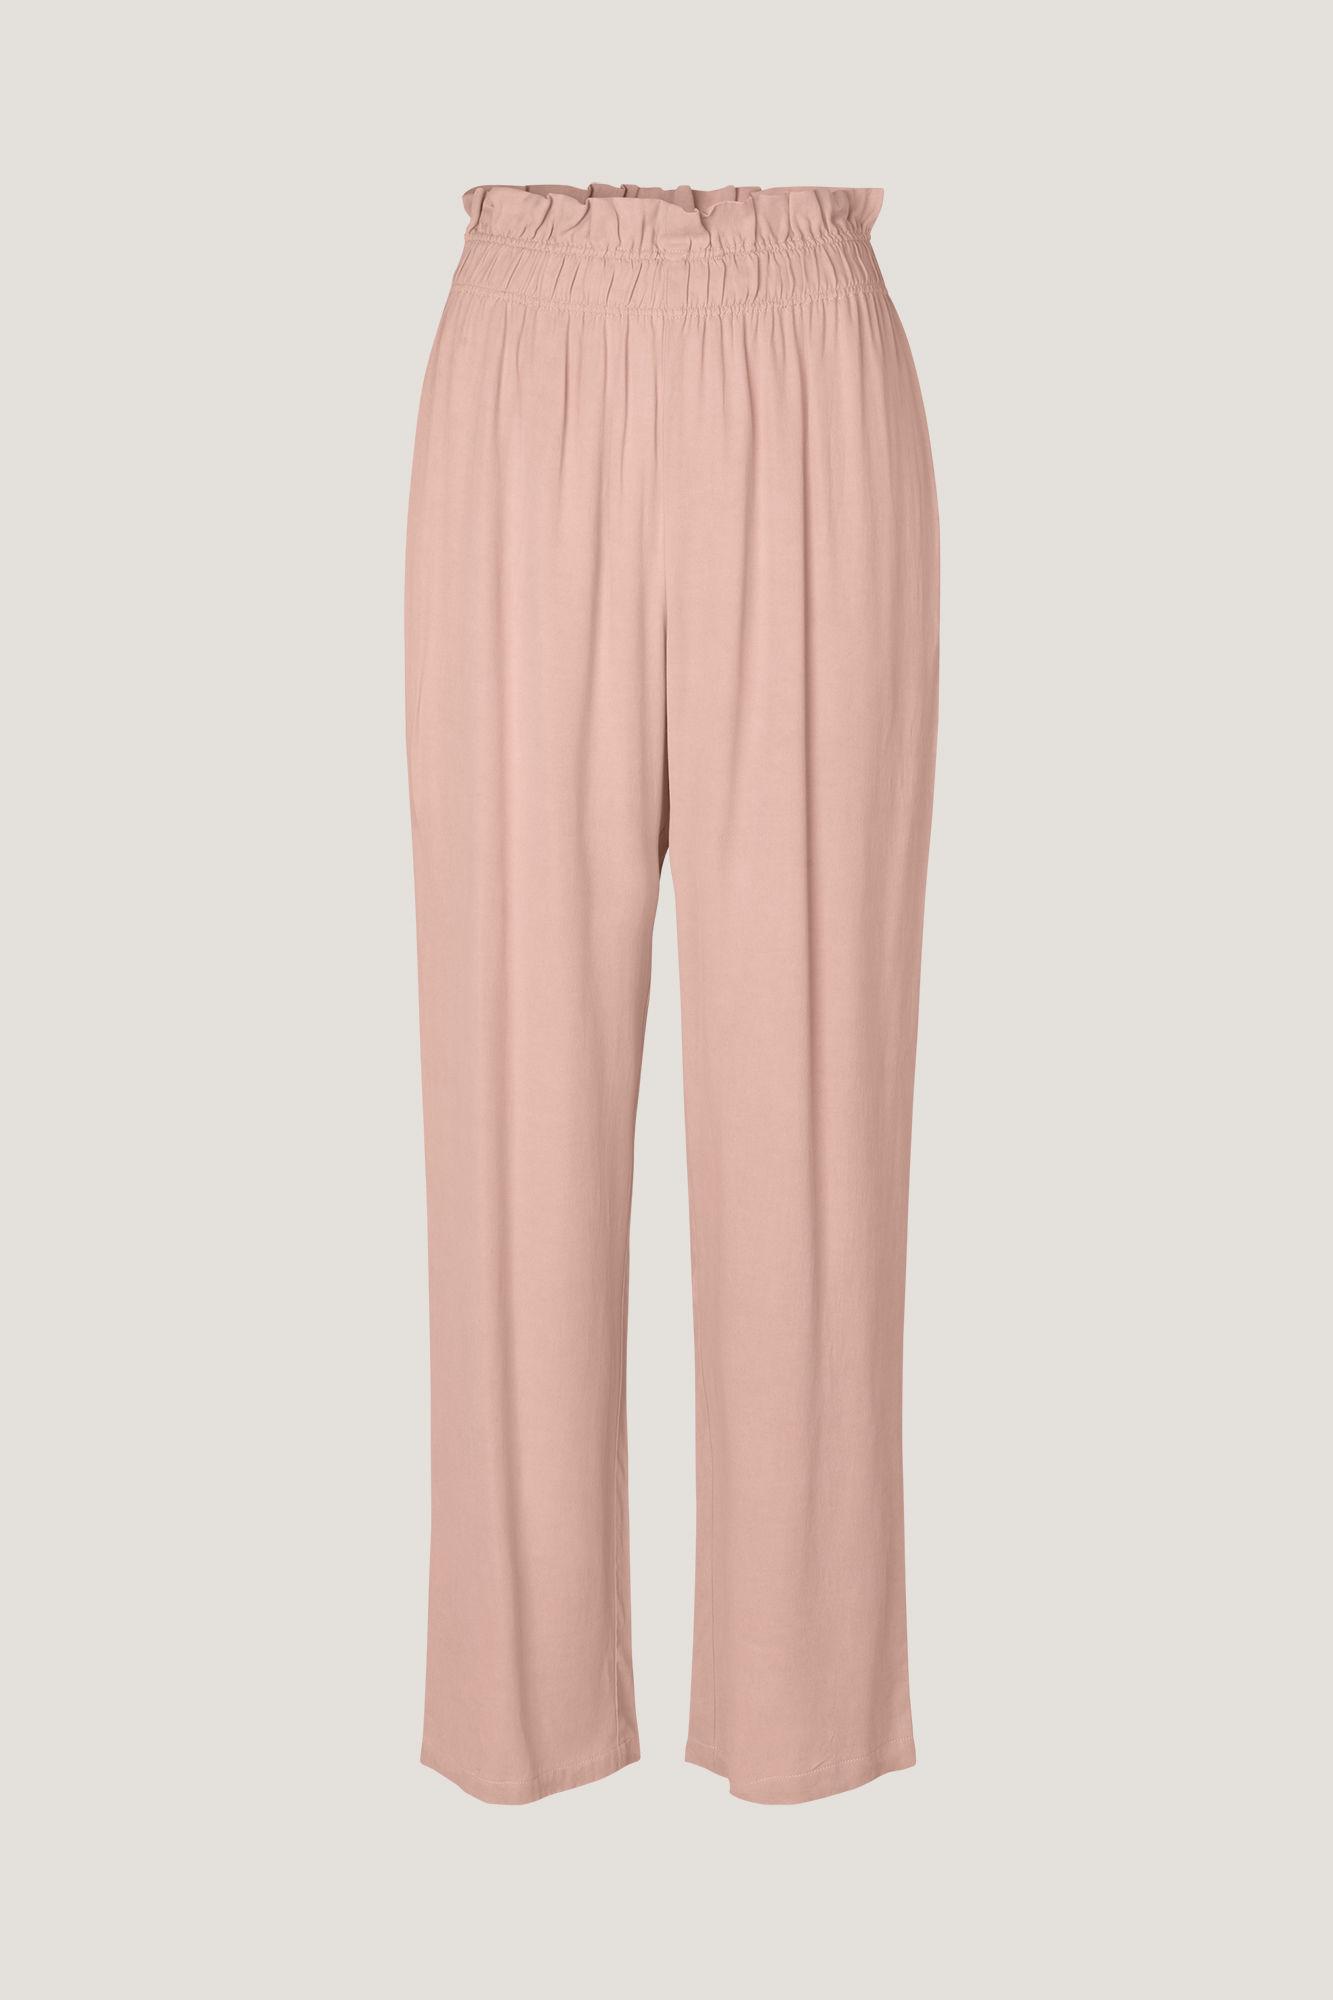 Malayo pants 9941 Roze